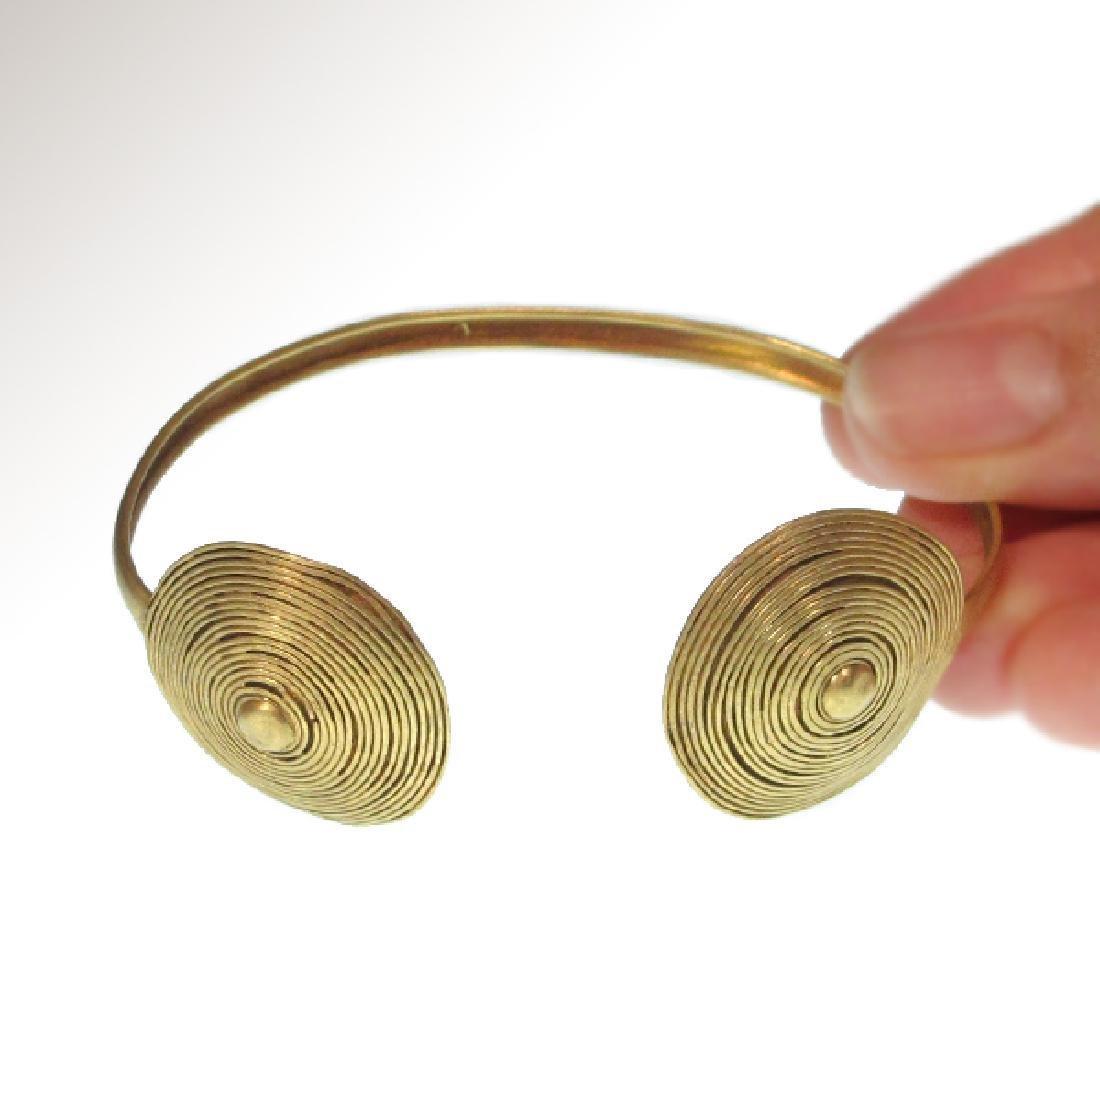 Roman Gold Bracelet, c. 2nd-3rd Century A.D.